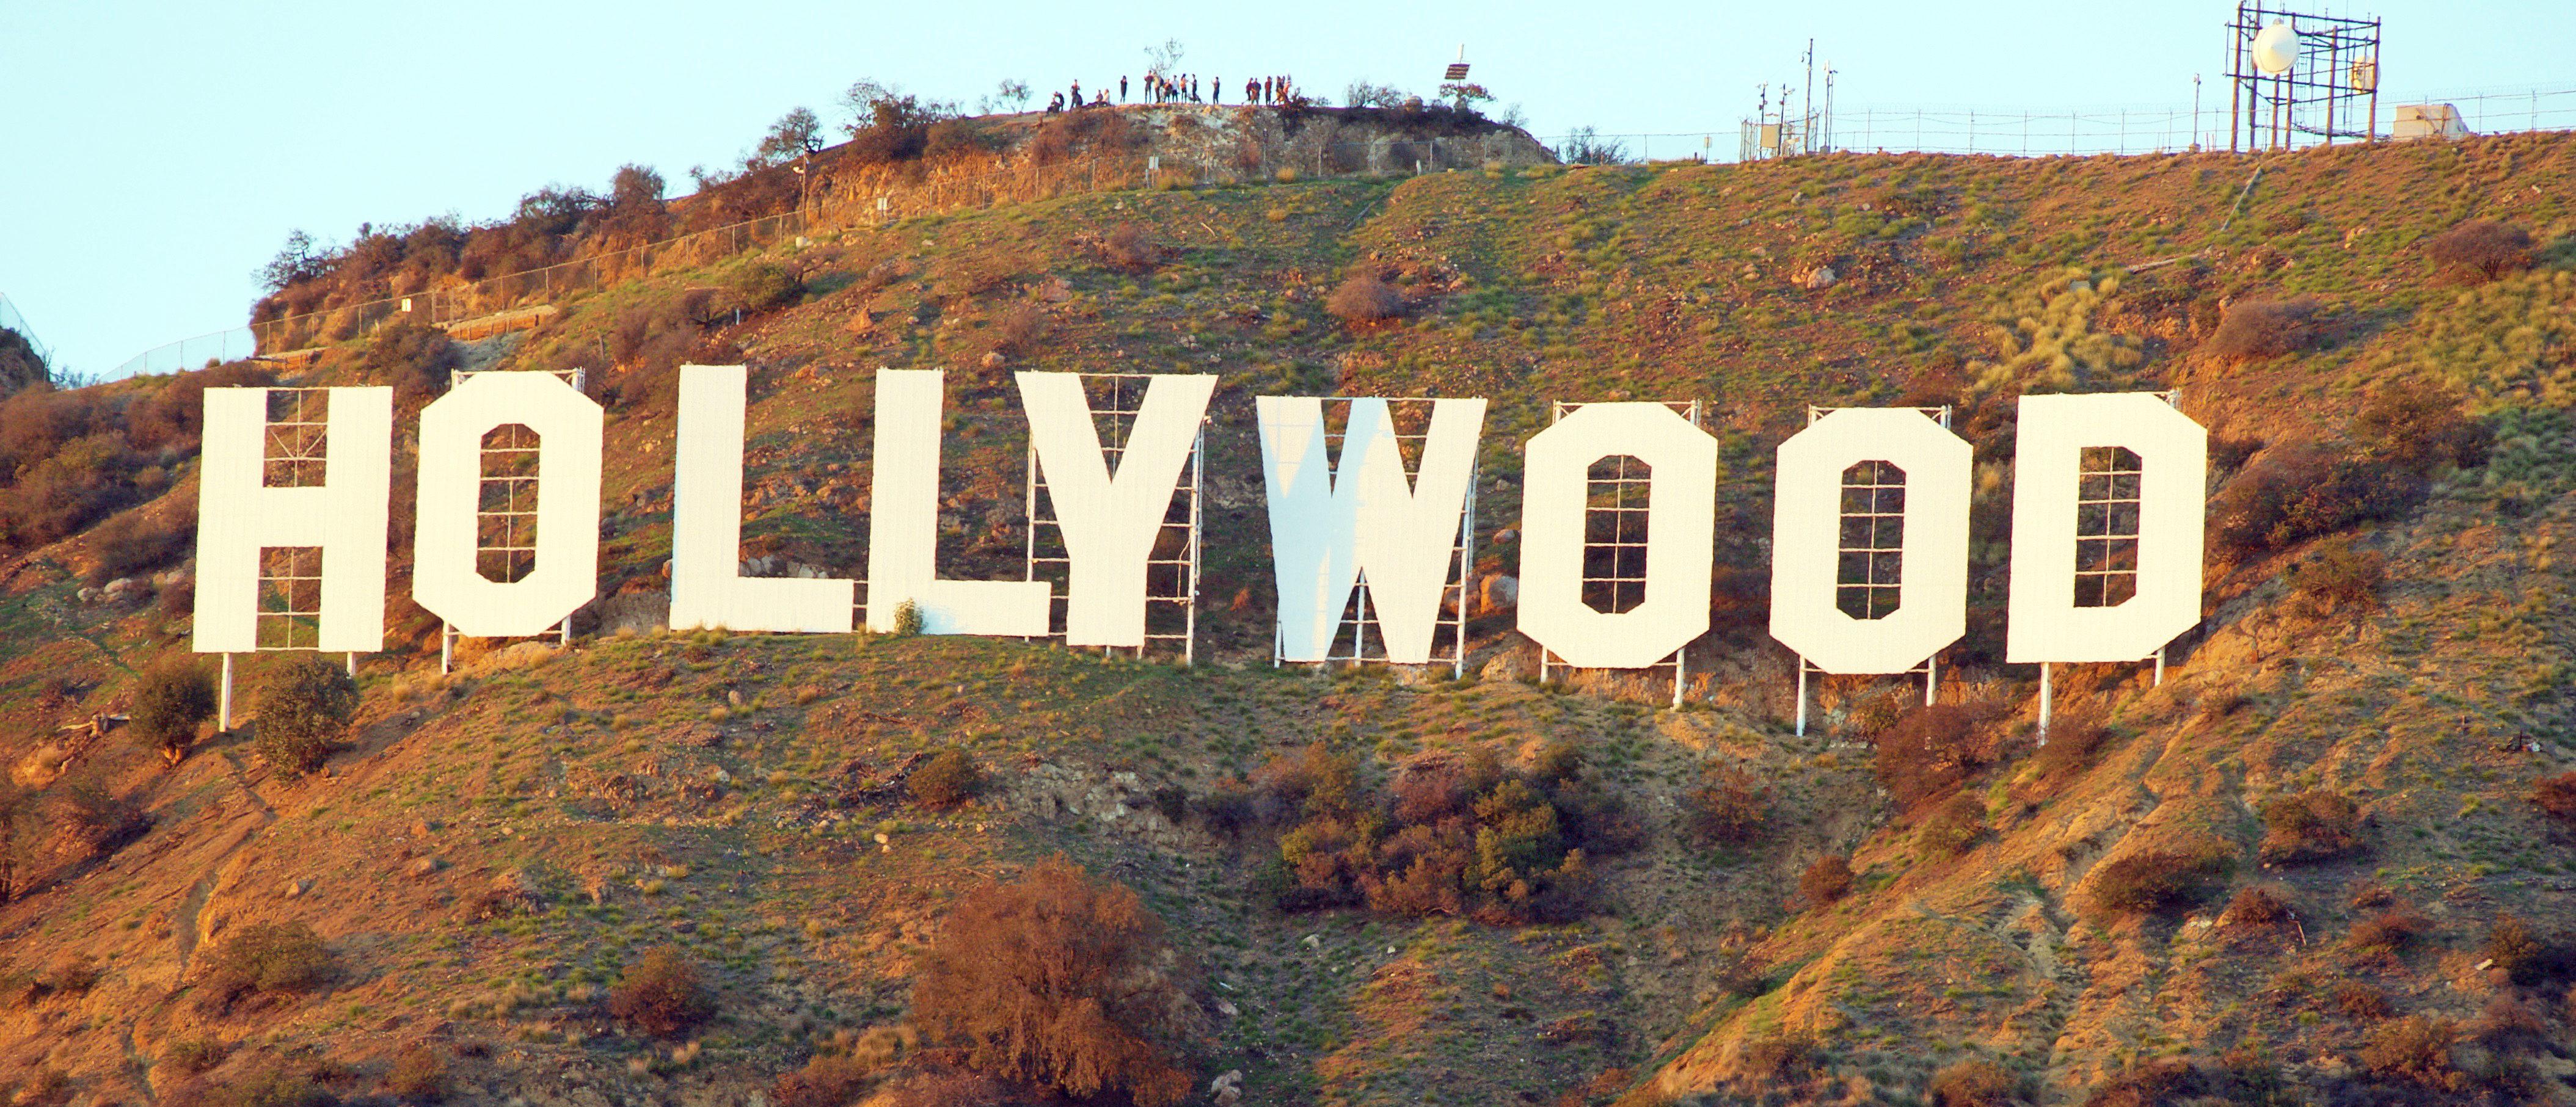 Hollywood sign, Shuttertsock